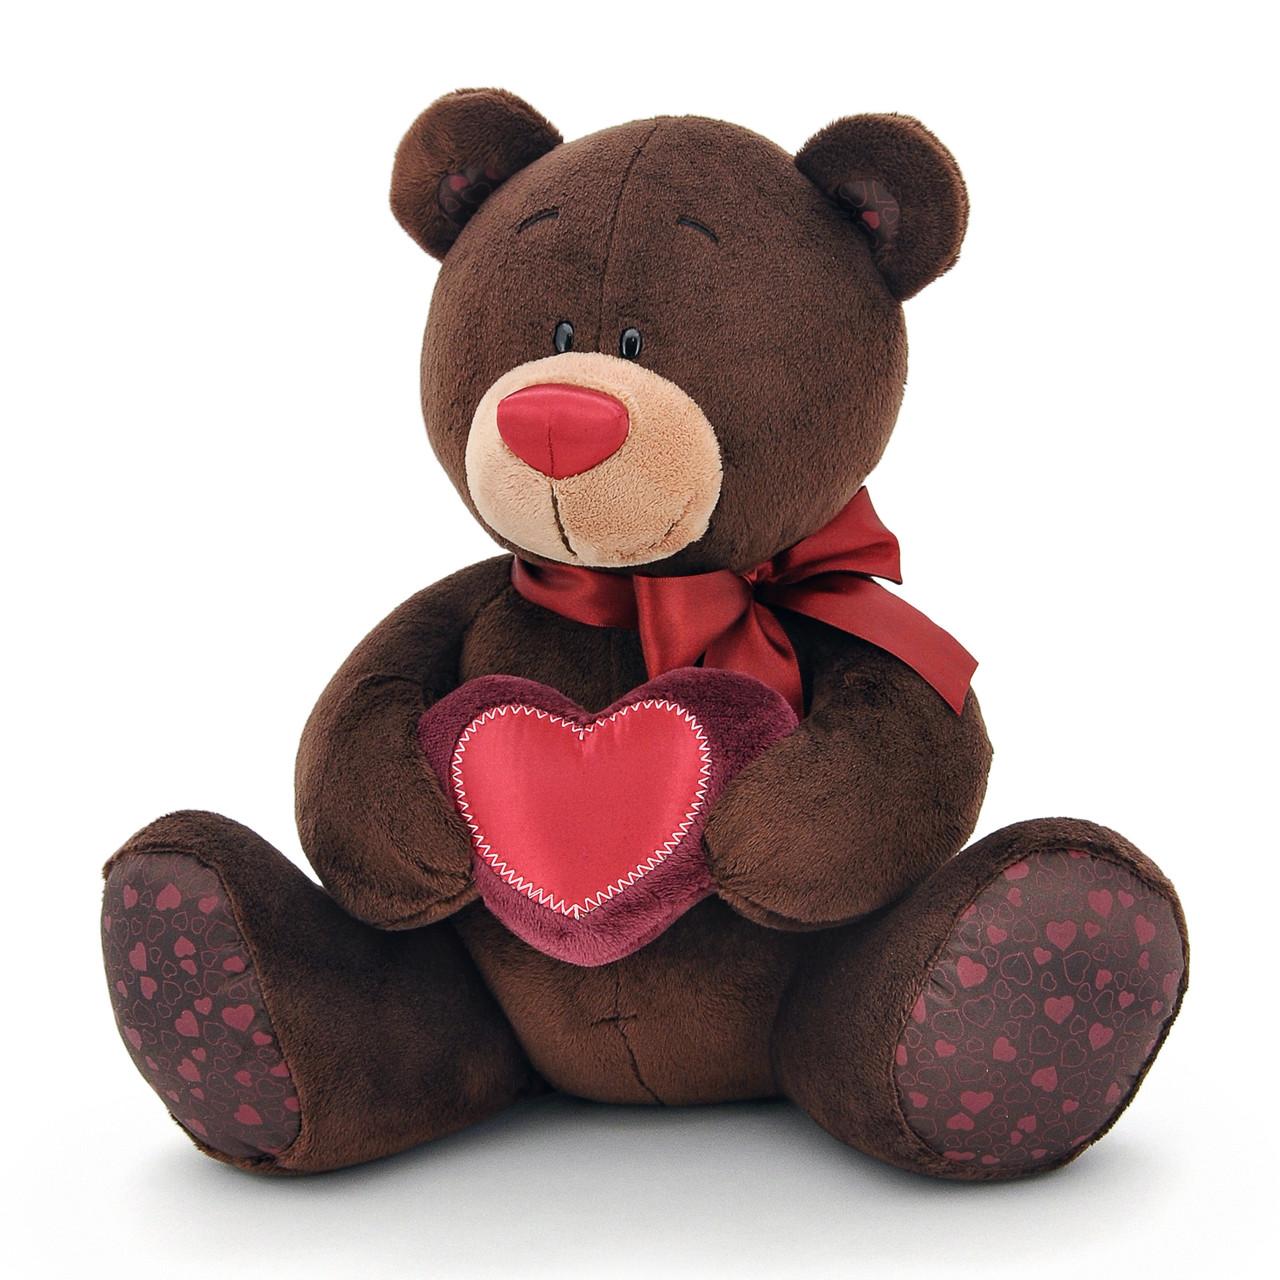 Мягкая игрушка «Orange» (C003/30) медвежонок Choco  с сердечком сидячий, 30 см